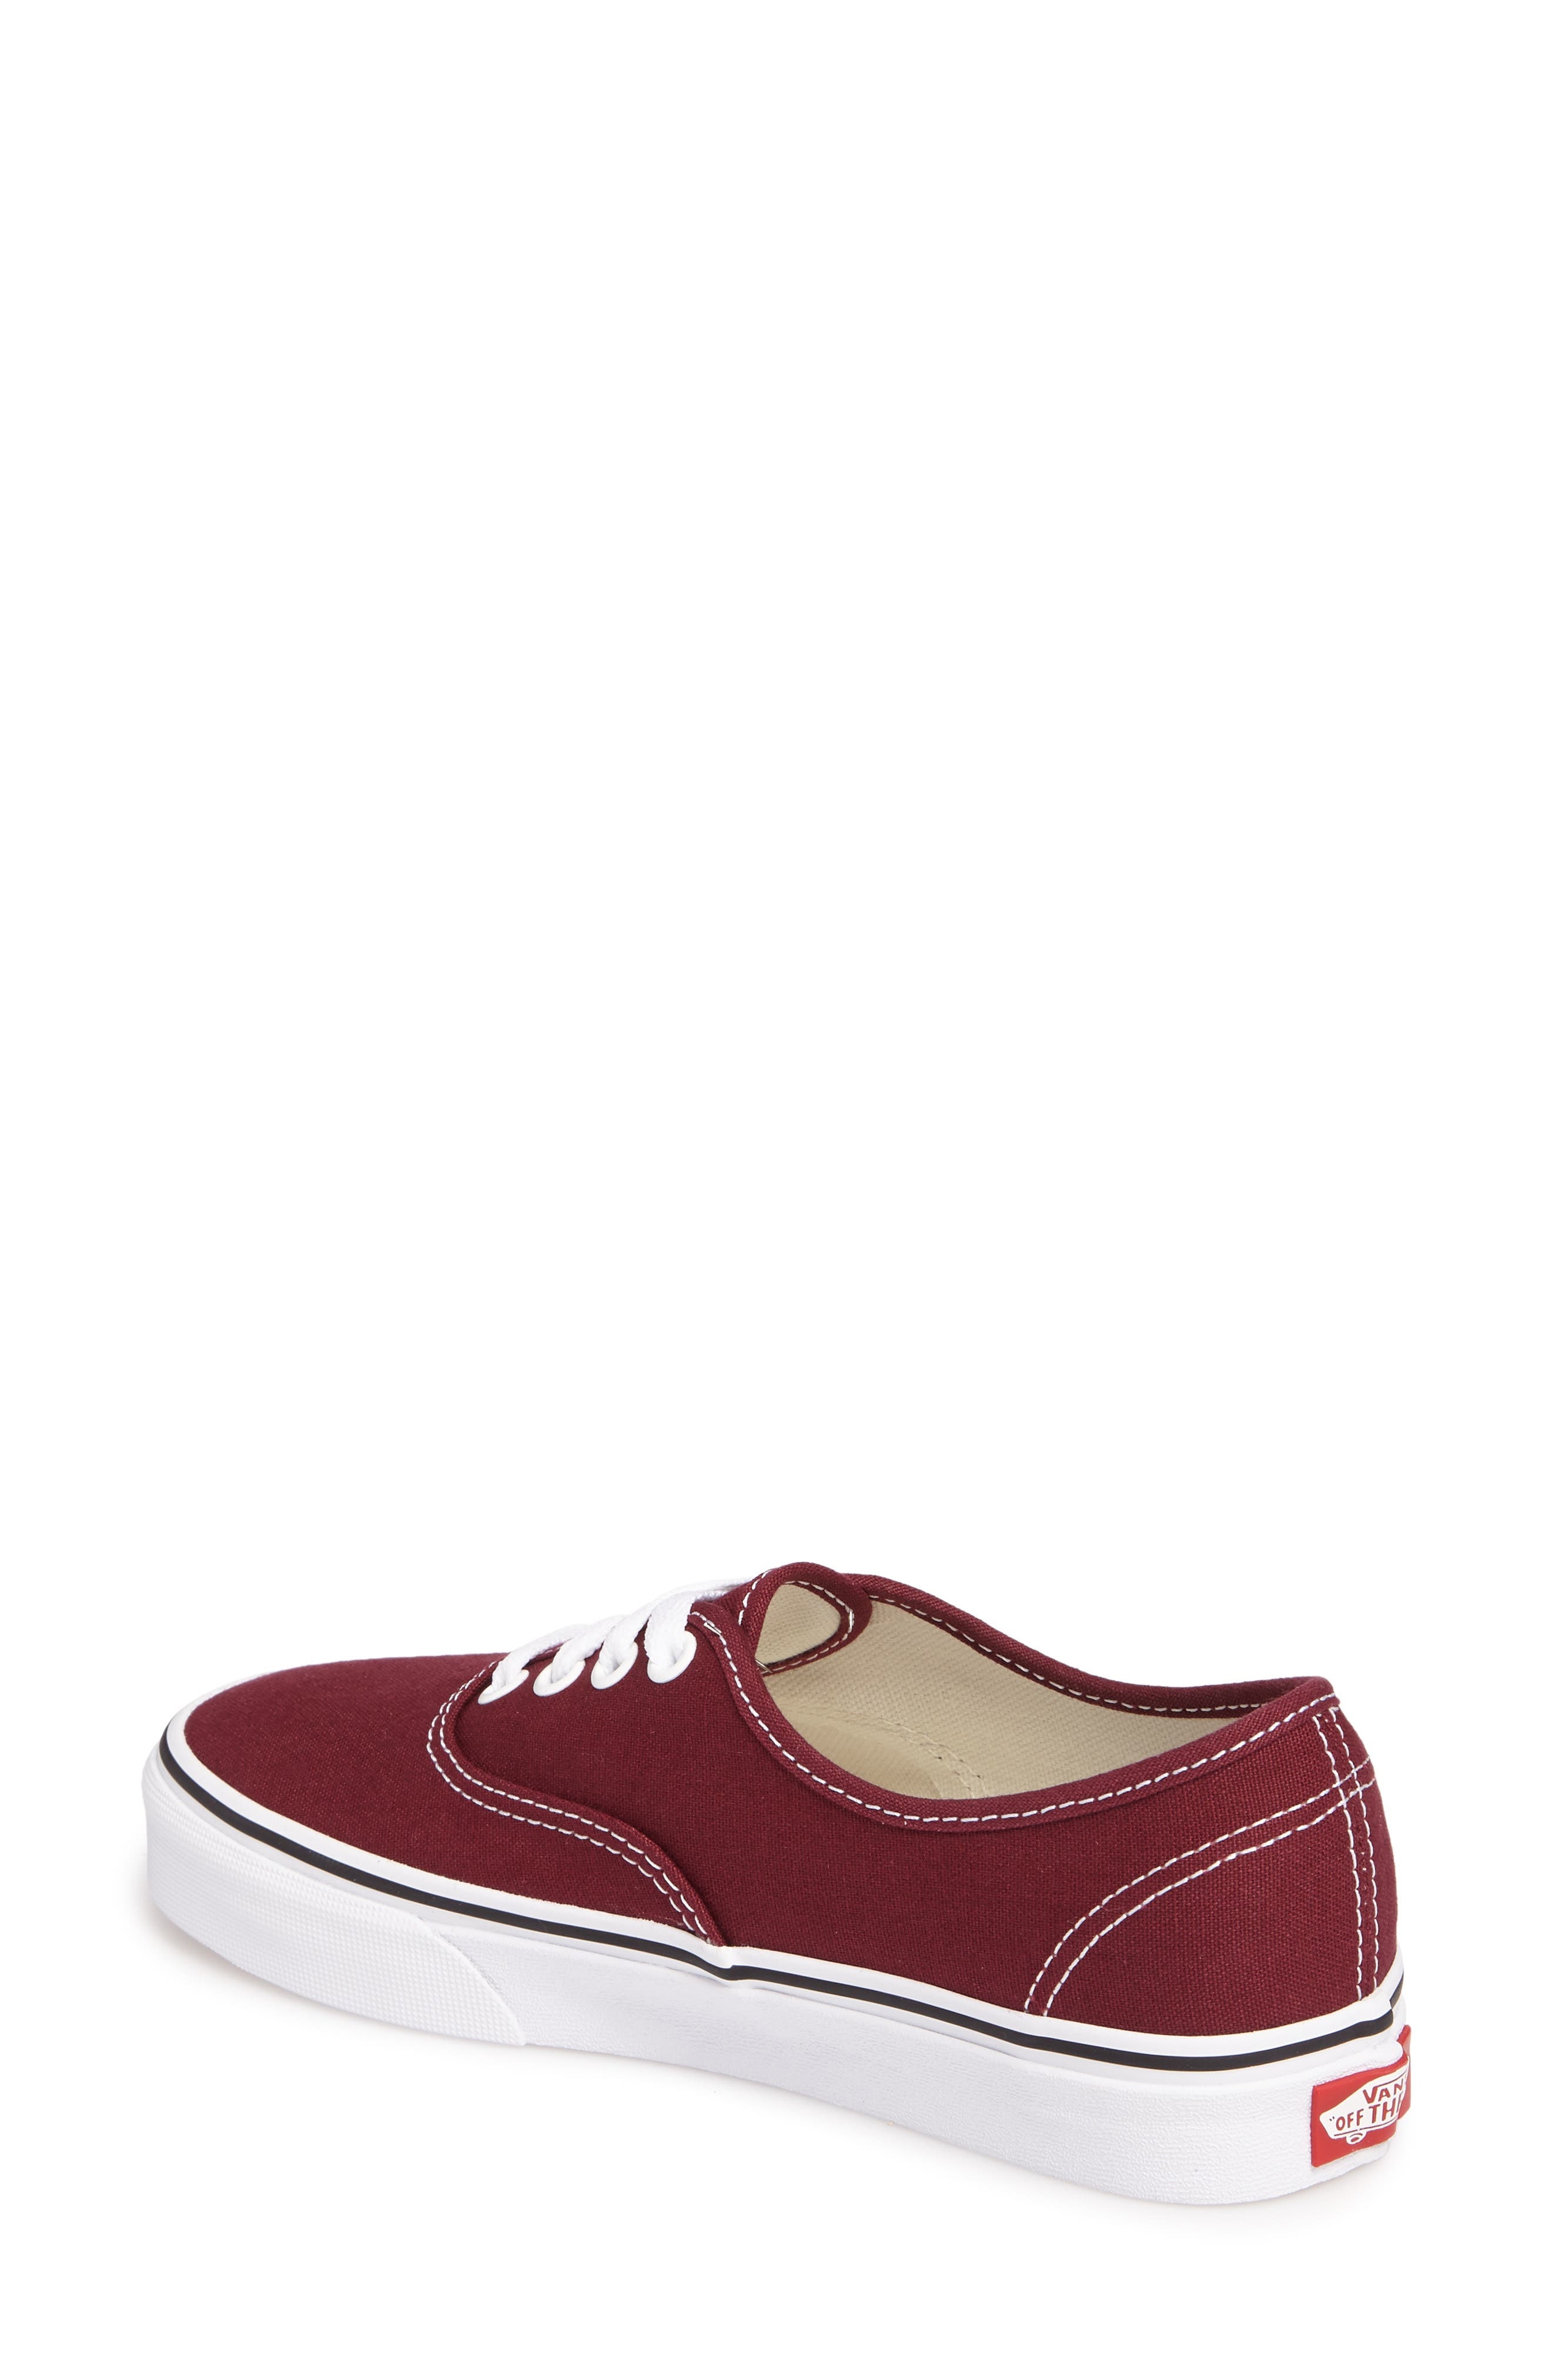 ,                             'Authentic' Sneaker,                             Alternate thumbnail 506, color,                             931